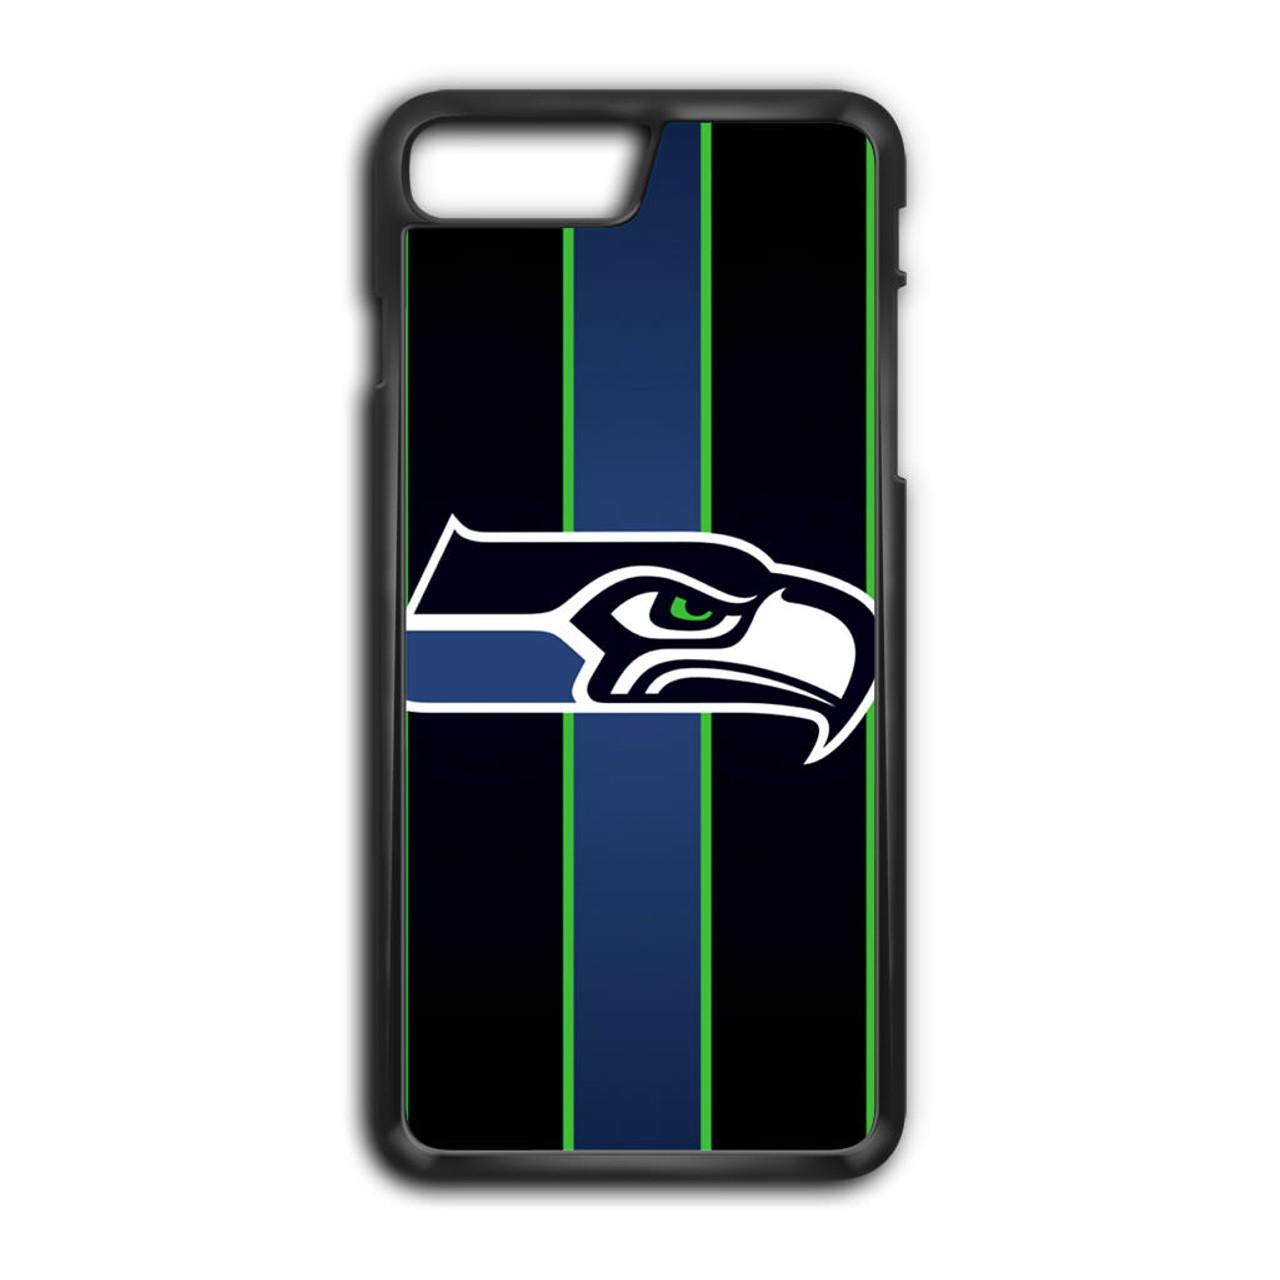 iphone 7 case seattle seahawks